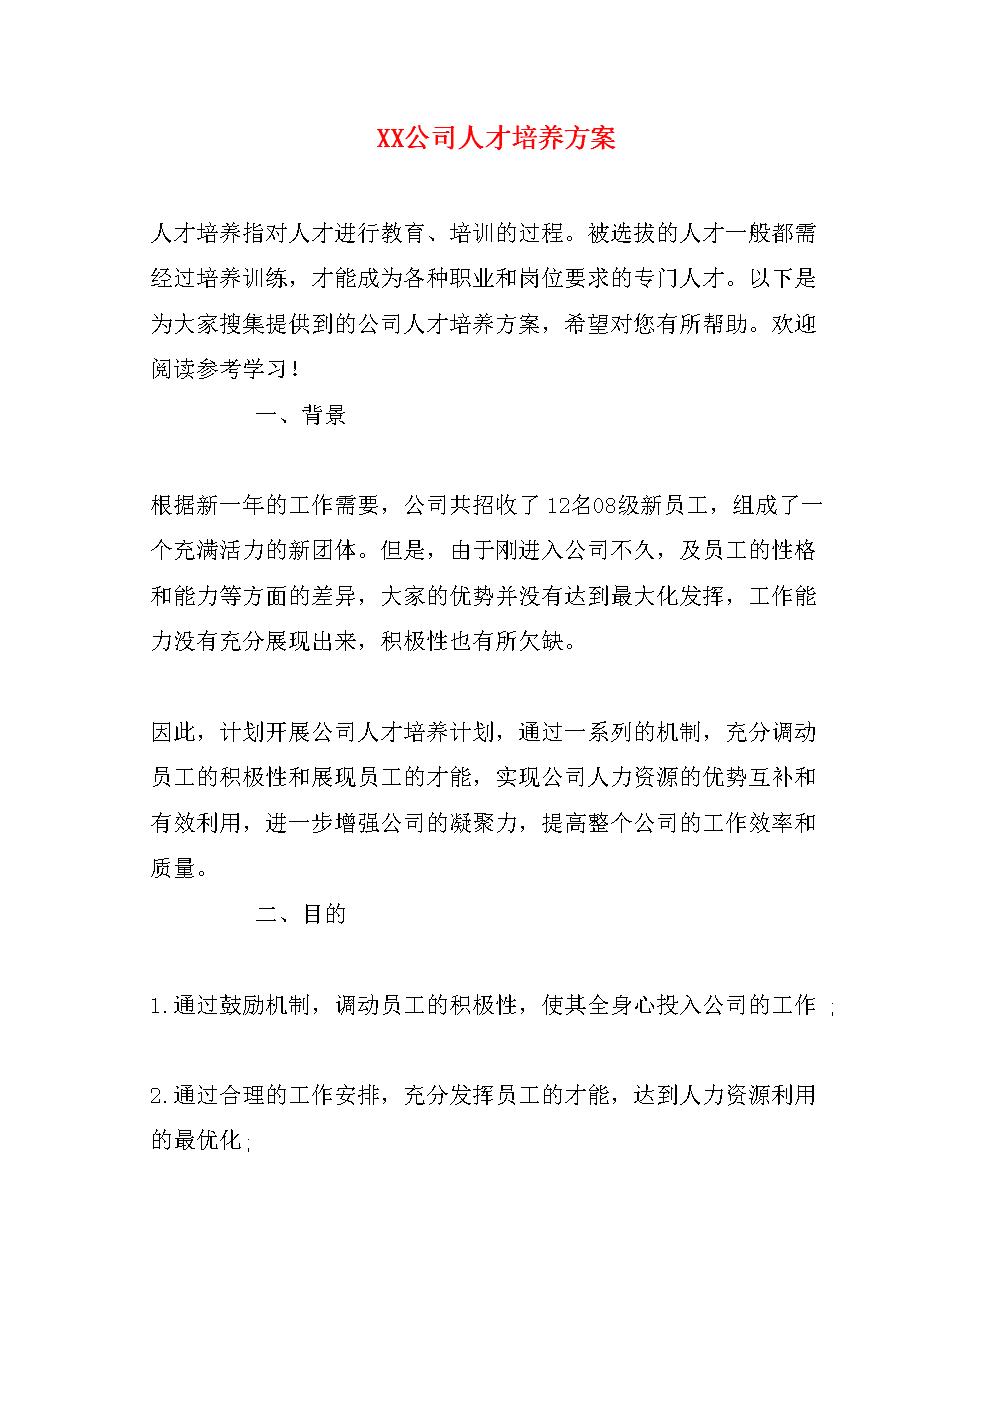 XX公司人才培养方案.doc